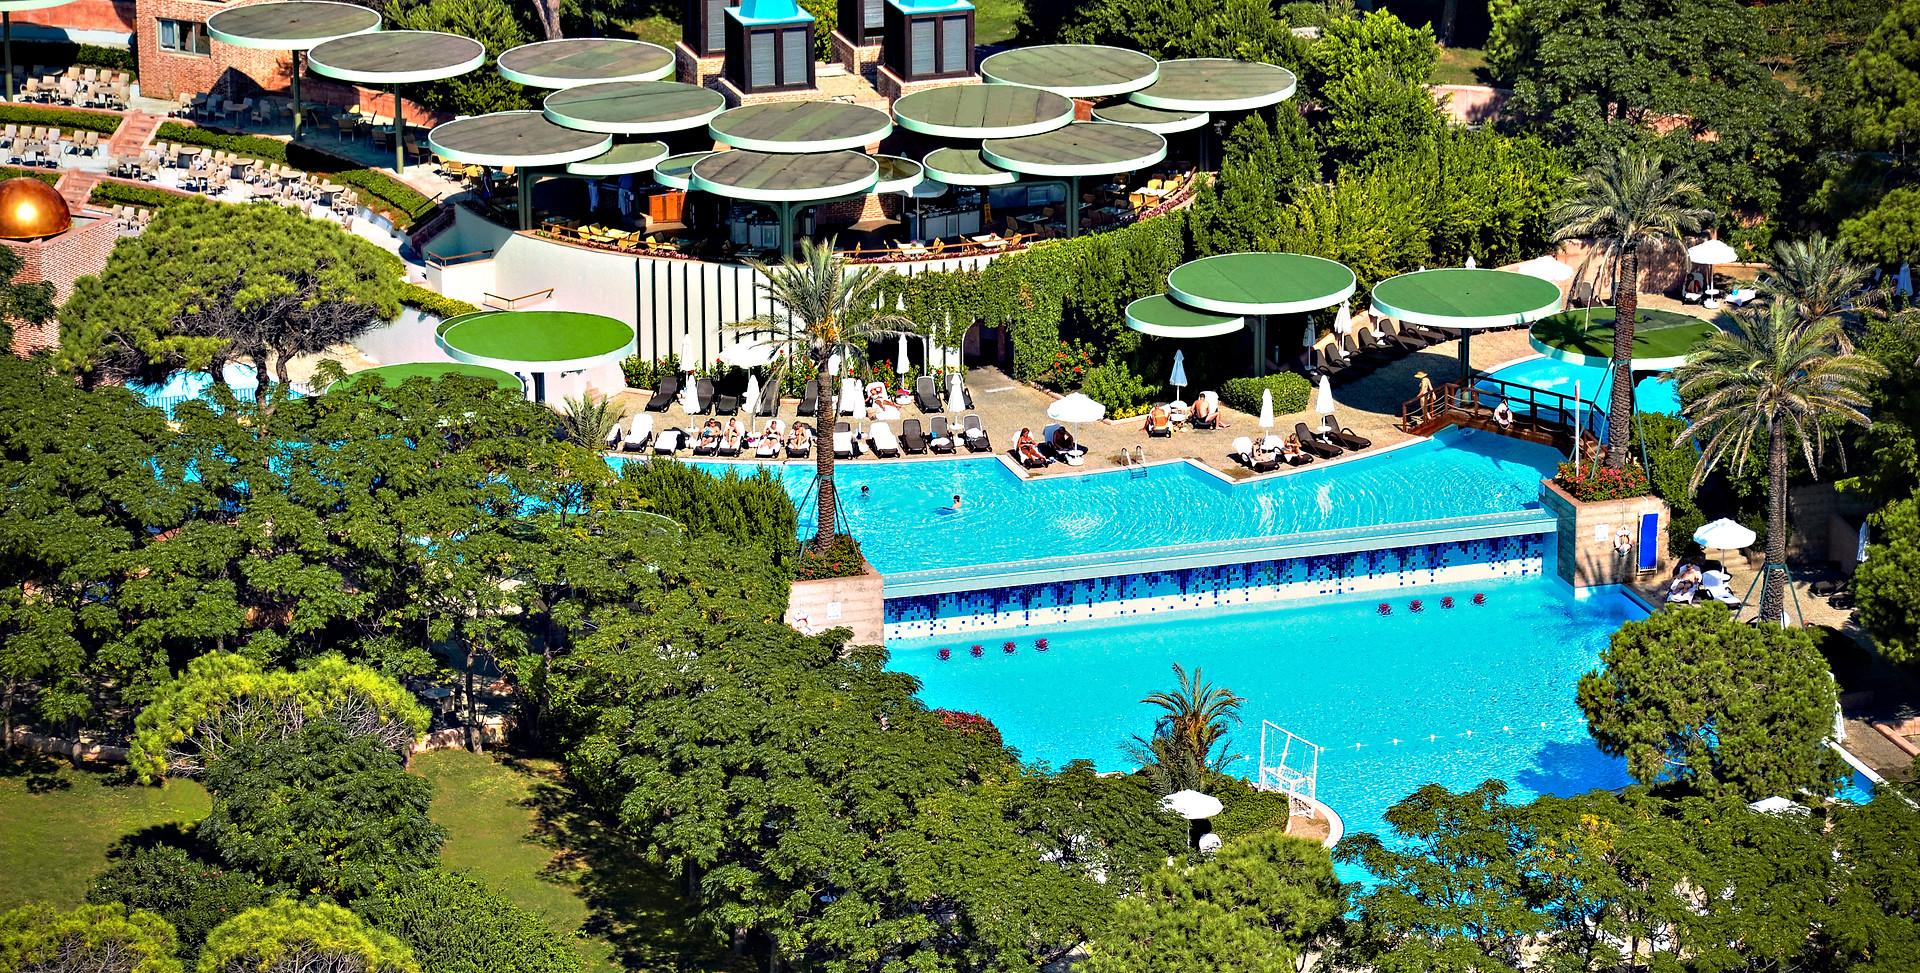 Gloria_verde_resort_puregolf-travel (14)